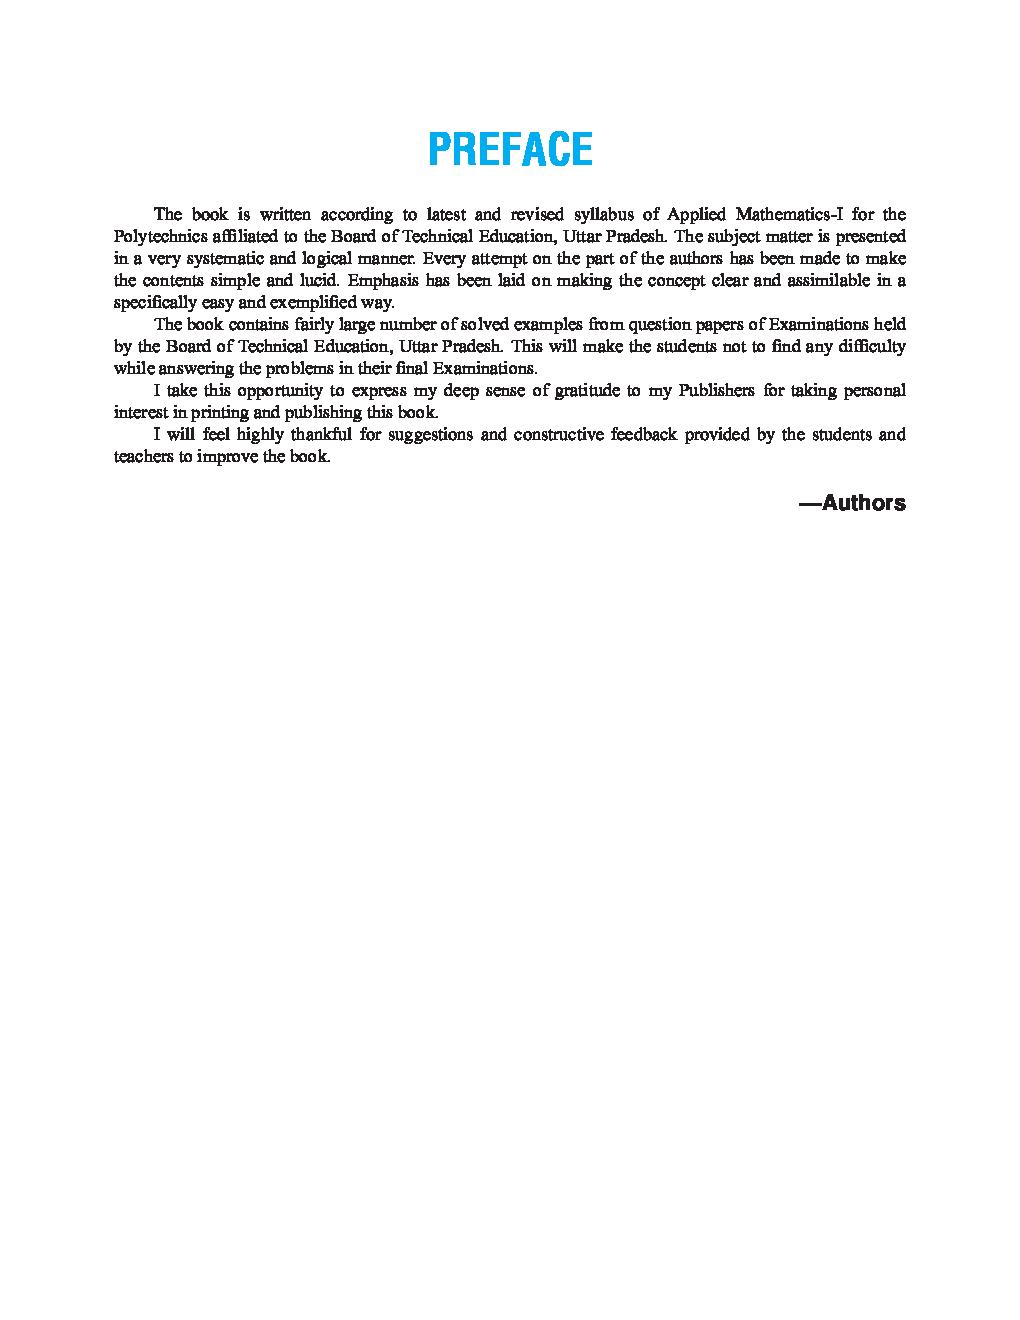 Applied Mathematics-I - Page 4